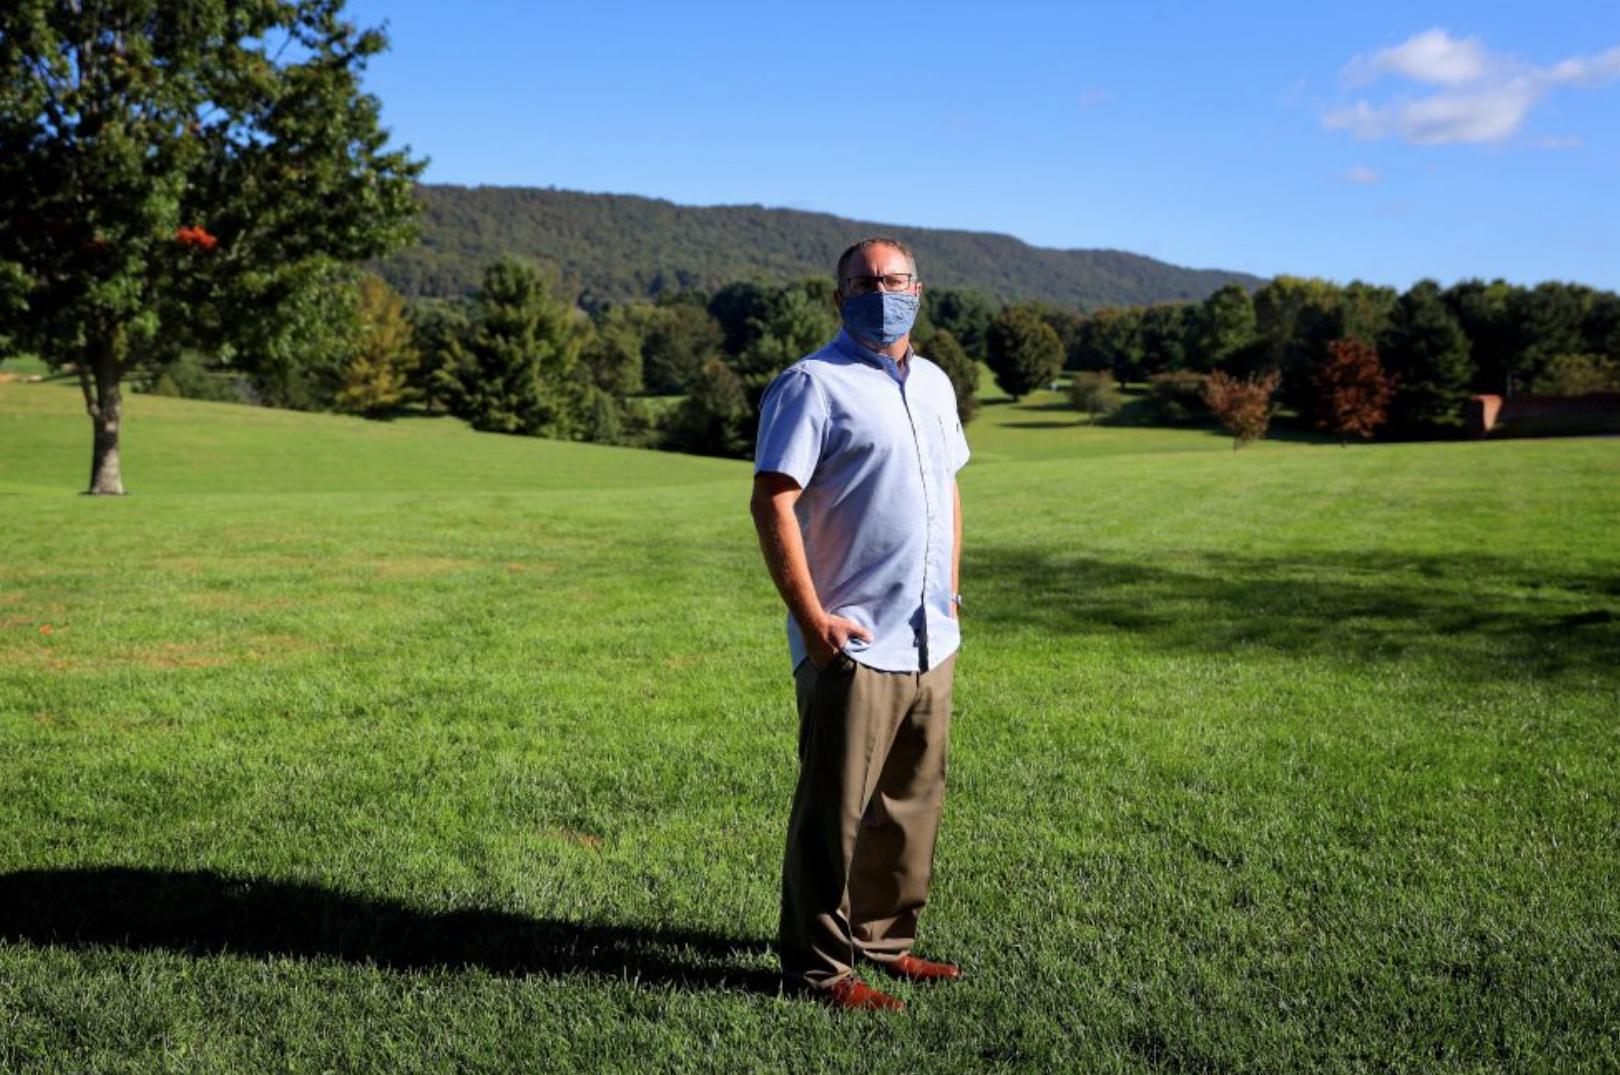 Human Dimensions of Water: Luke Juran Brings Water Science Home to Va